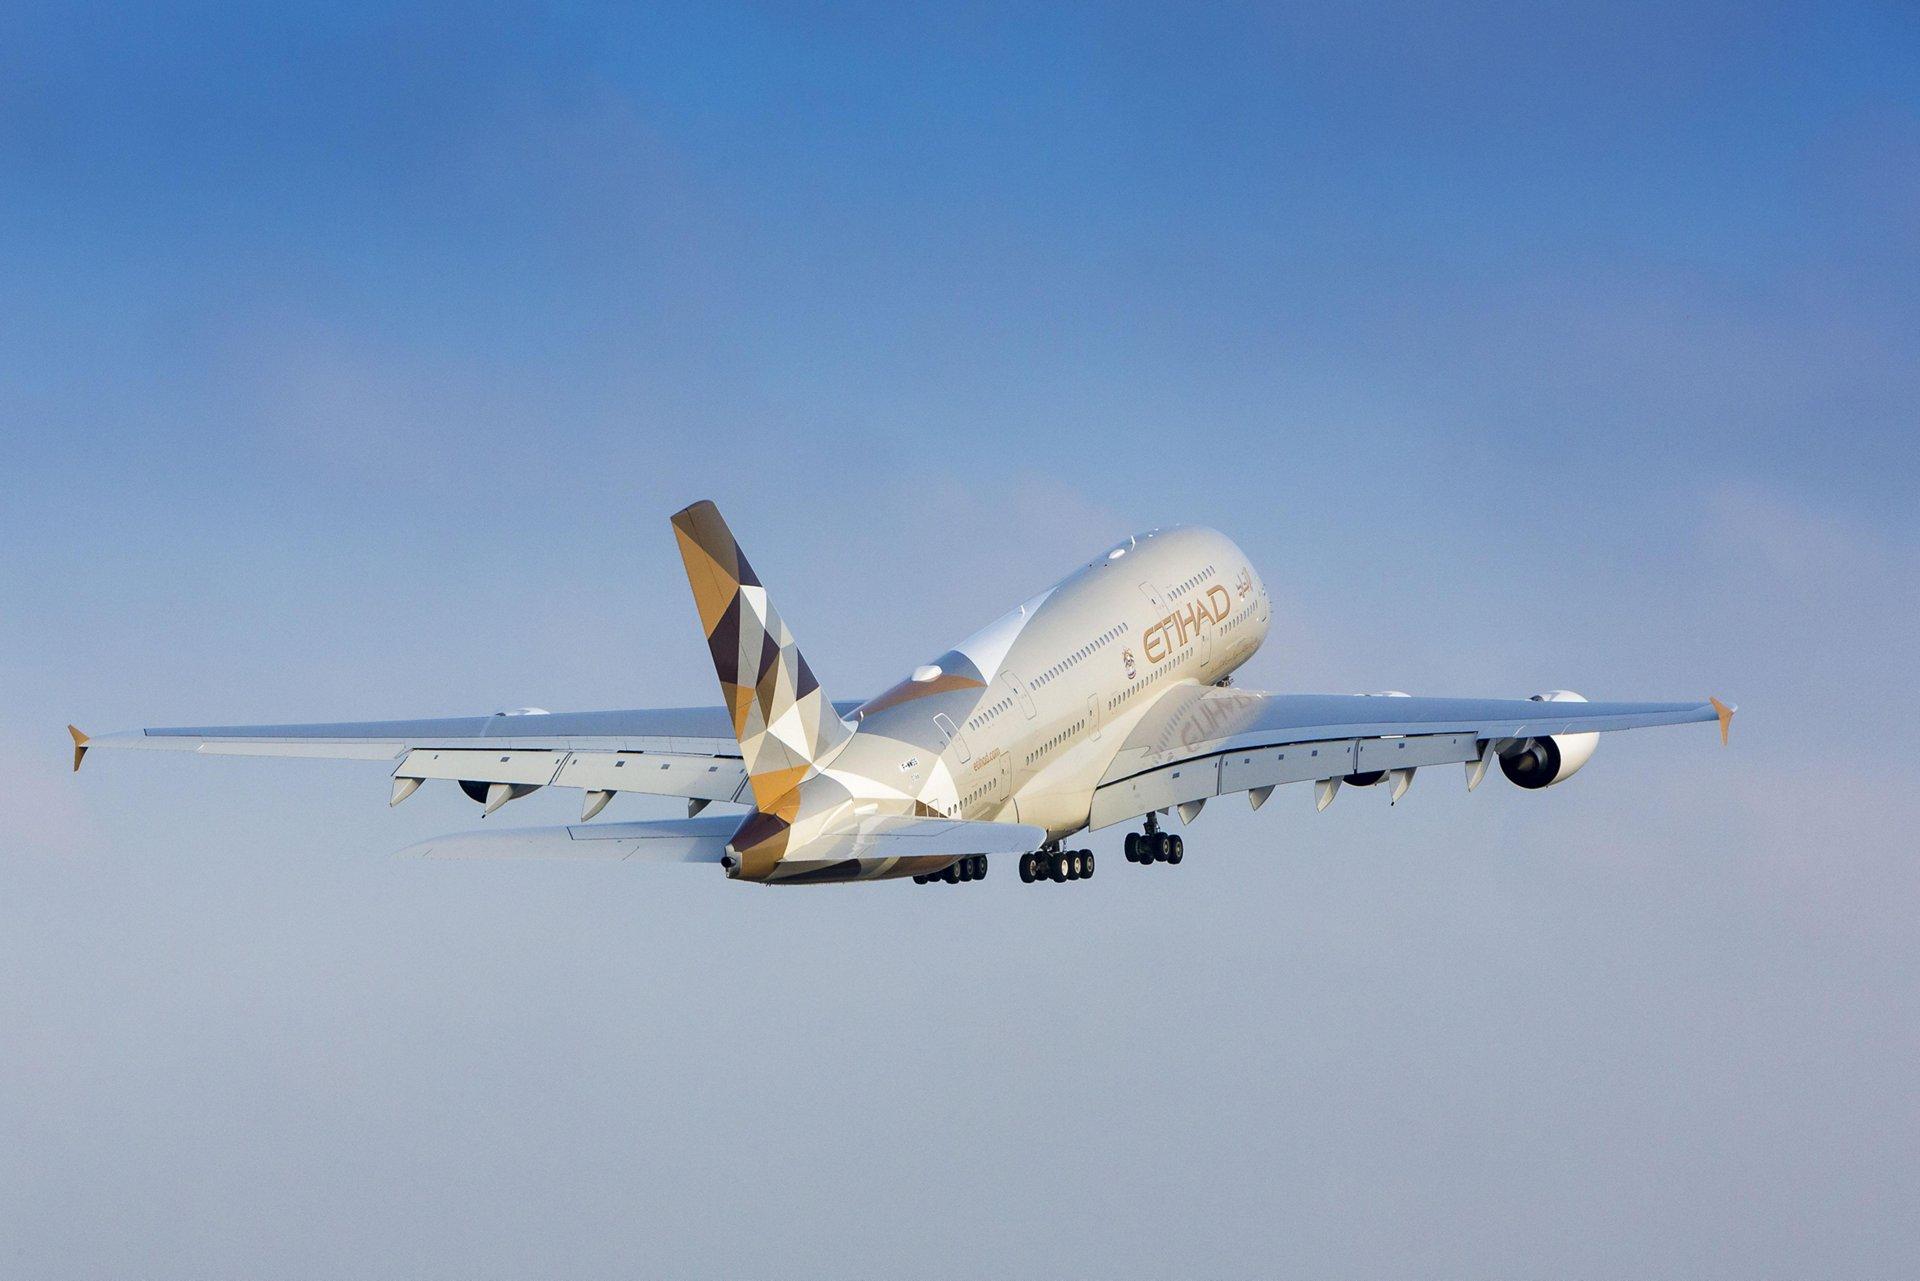 A380 Etihad - In flight 7